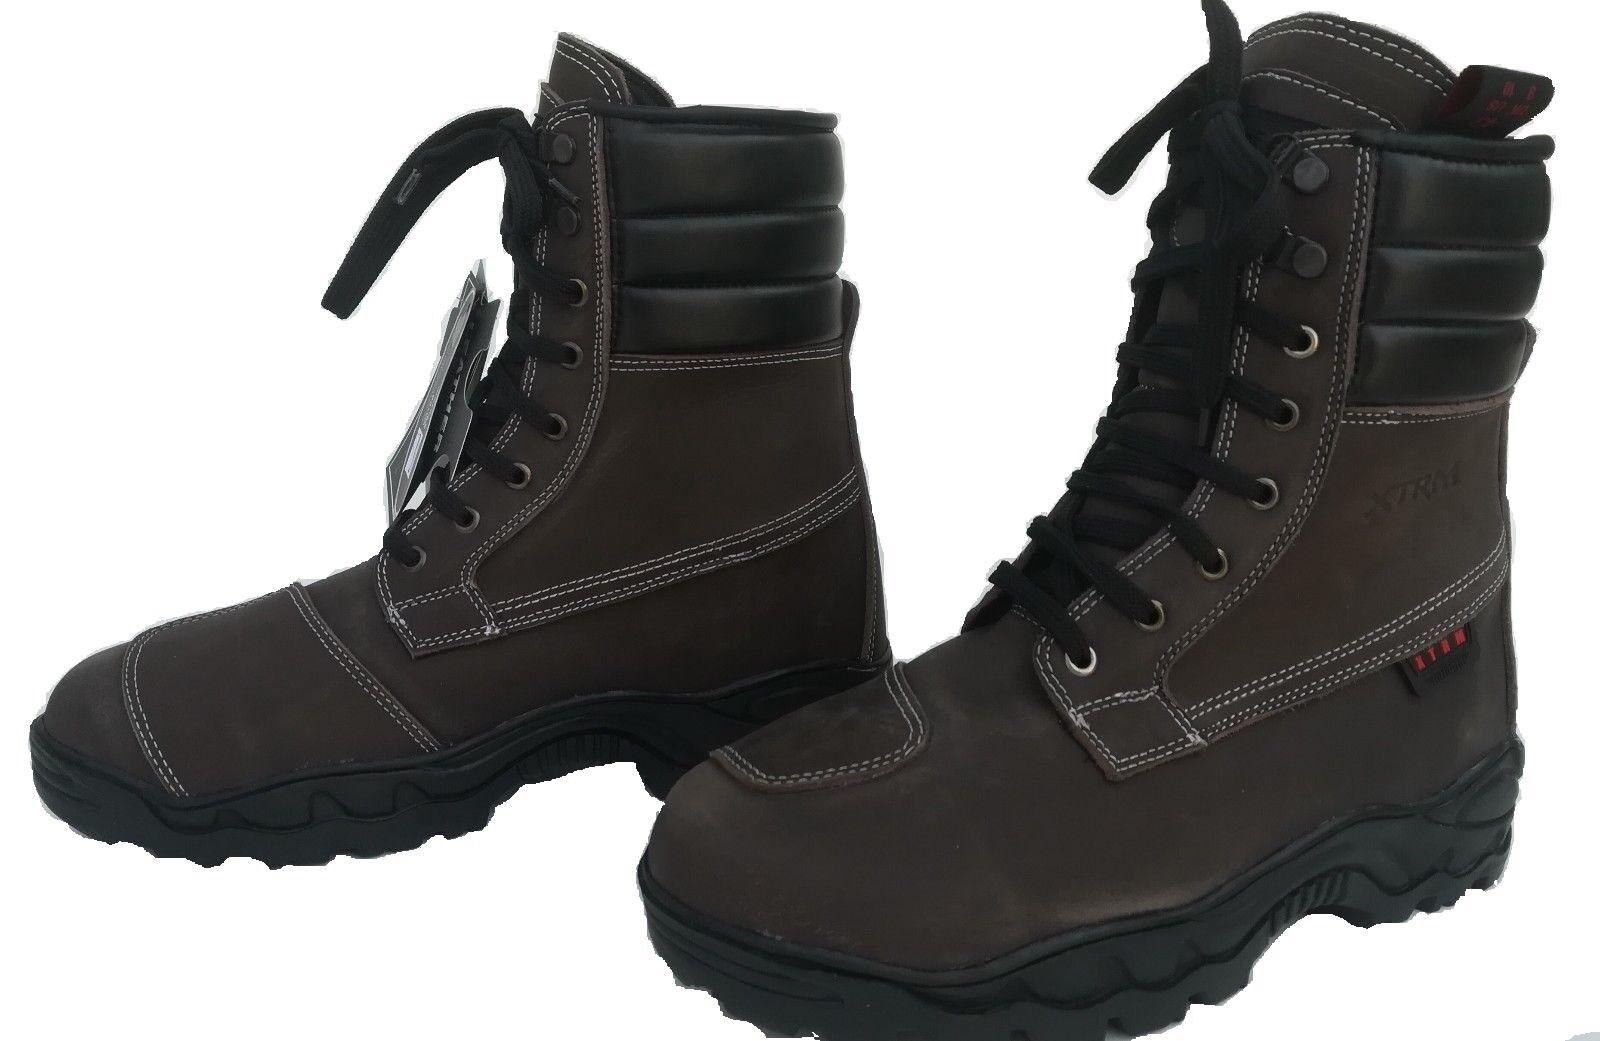 botas de moto touring para ciudad urbana armadura botas para touring caminar nuevo marrones 1c82f8